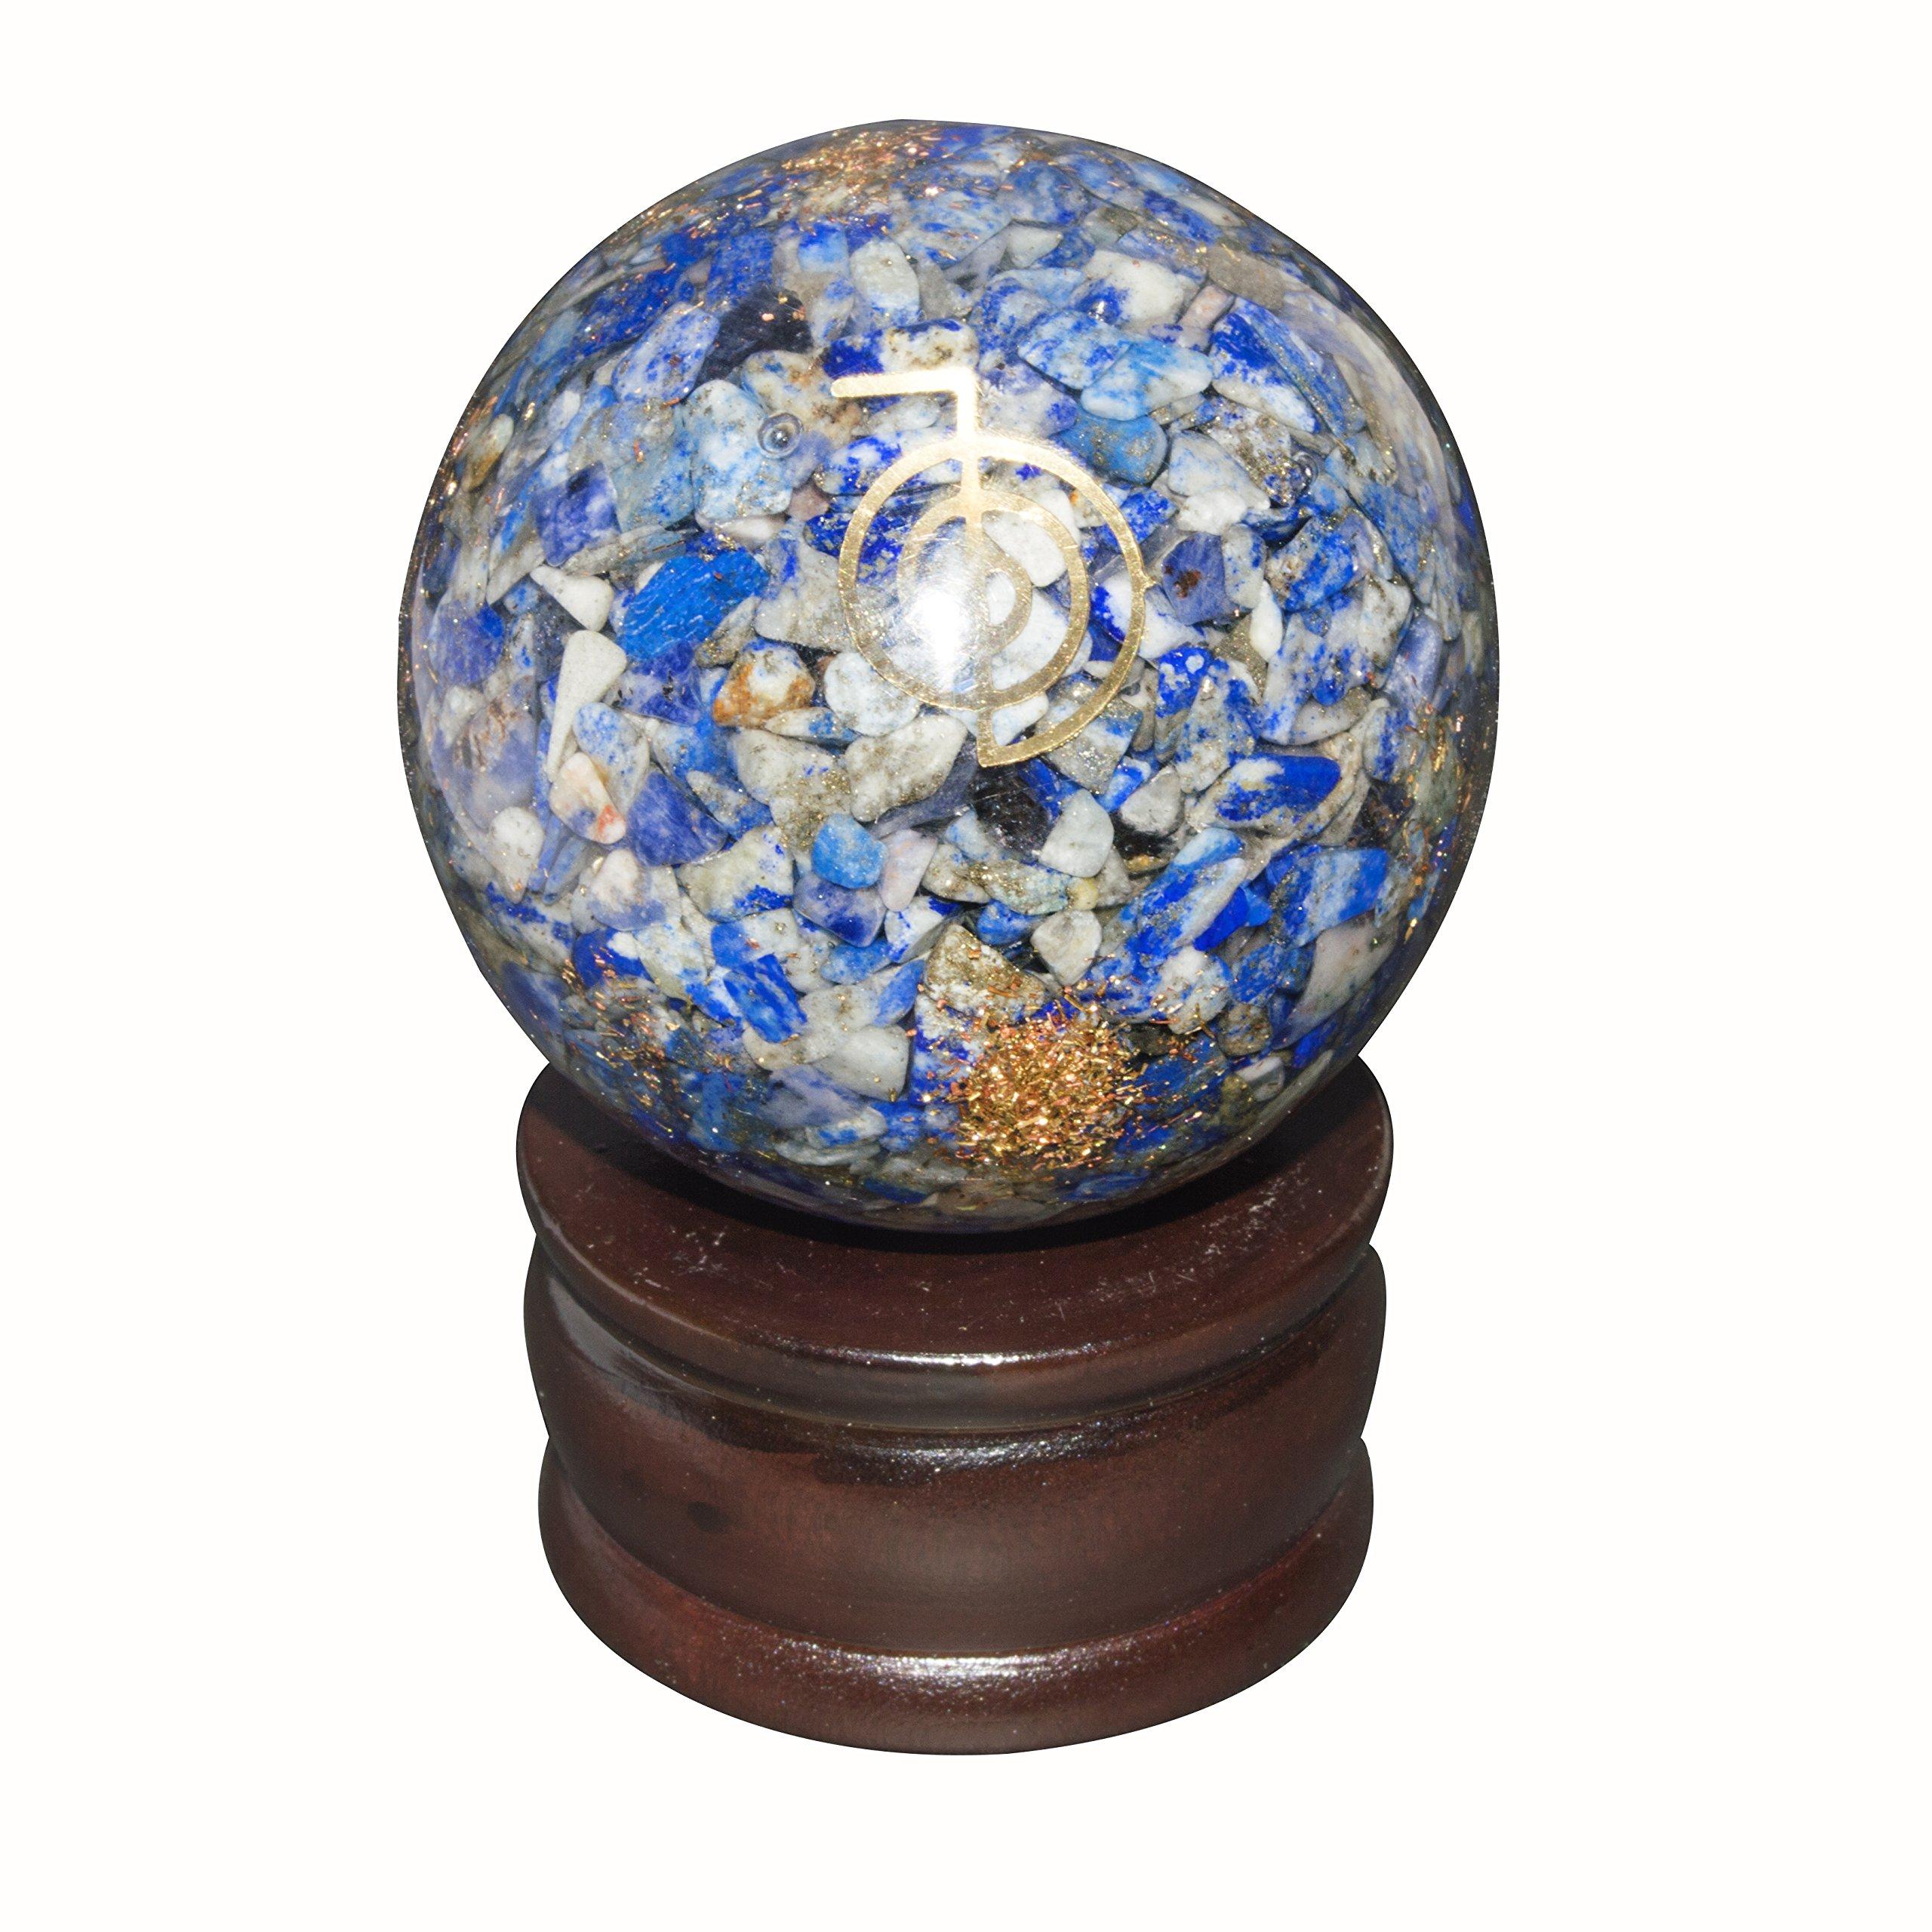 Crocon Lapis Lazuli Orgone Sphere Ball Cho Ku Rei Symbol Energy Generator for Reiki Healing Chakra Balancing & EMF Protection Size: 50-60mm